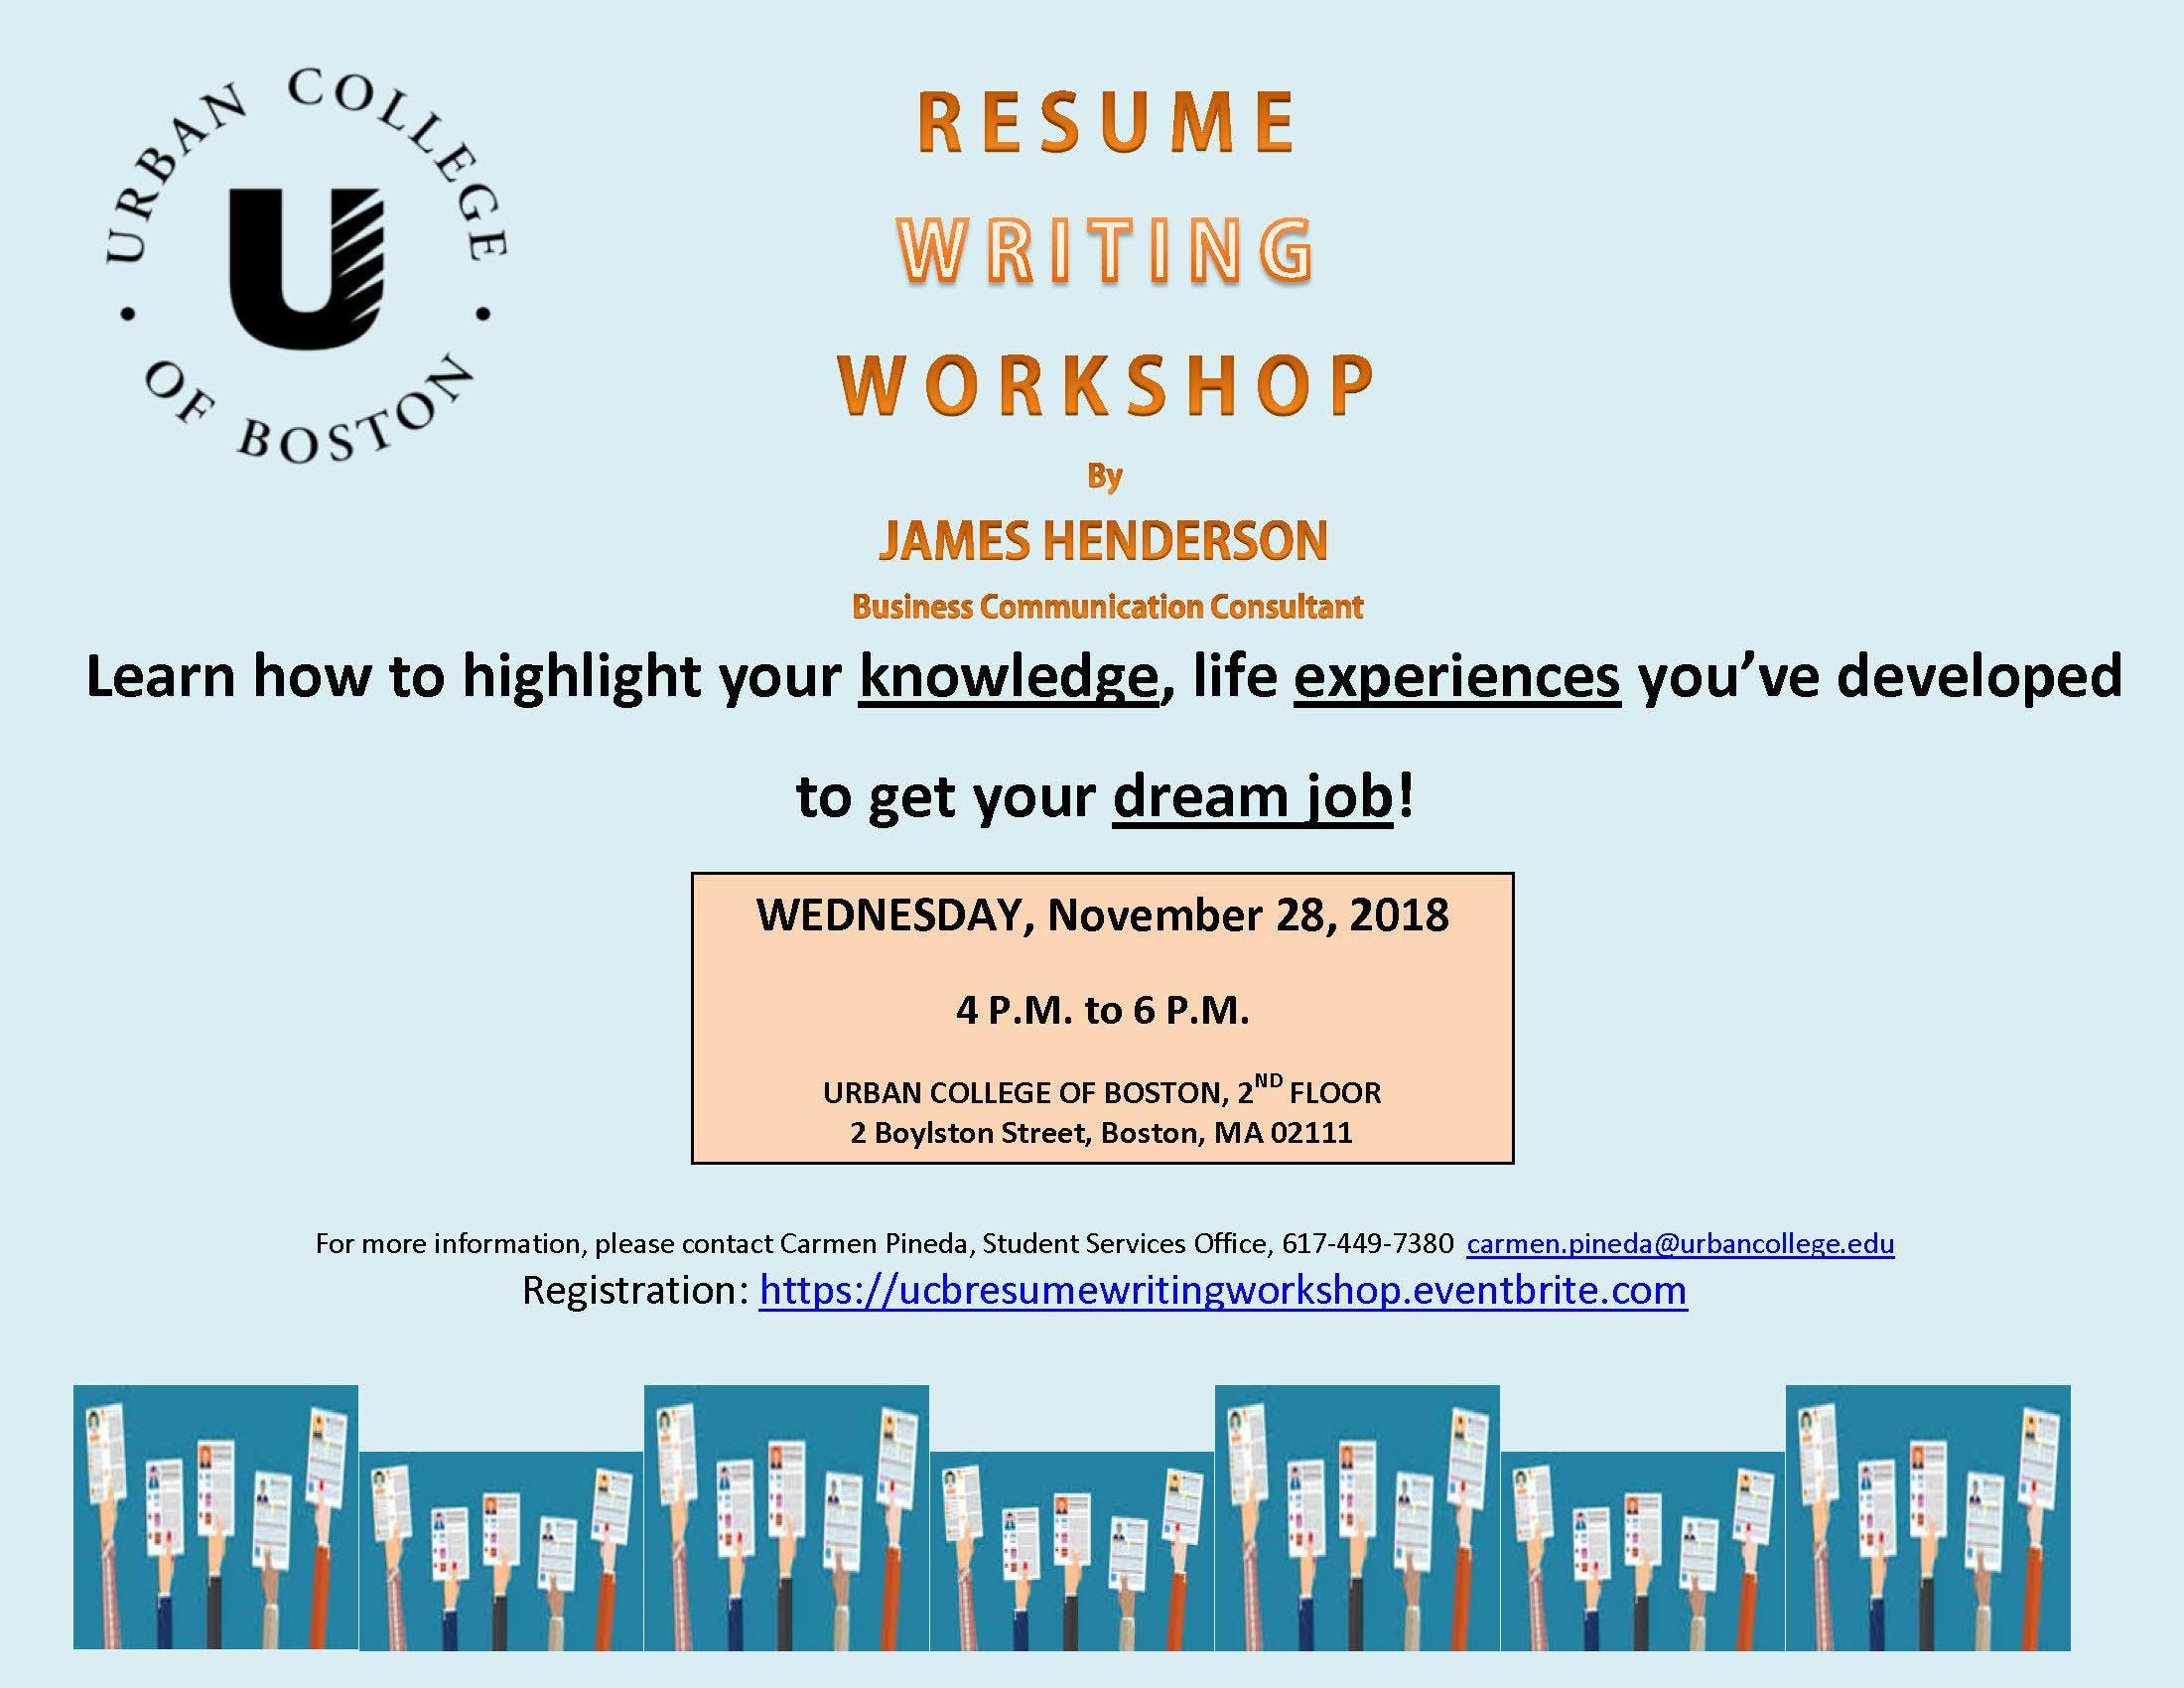 resume writing workshop at urban college of boston boston